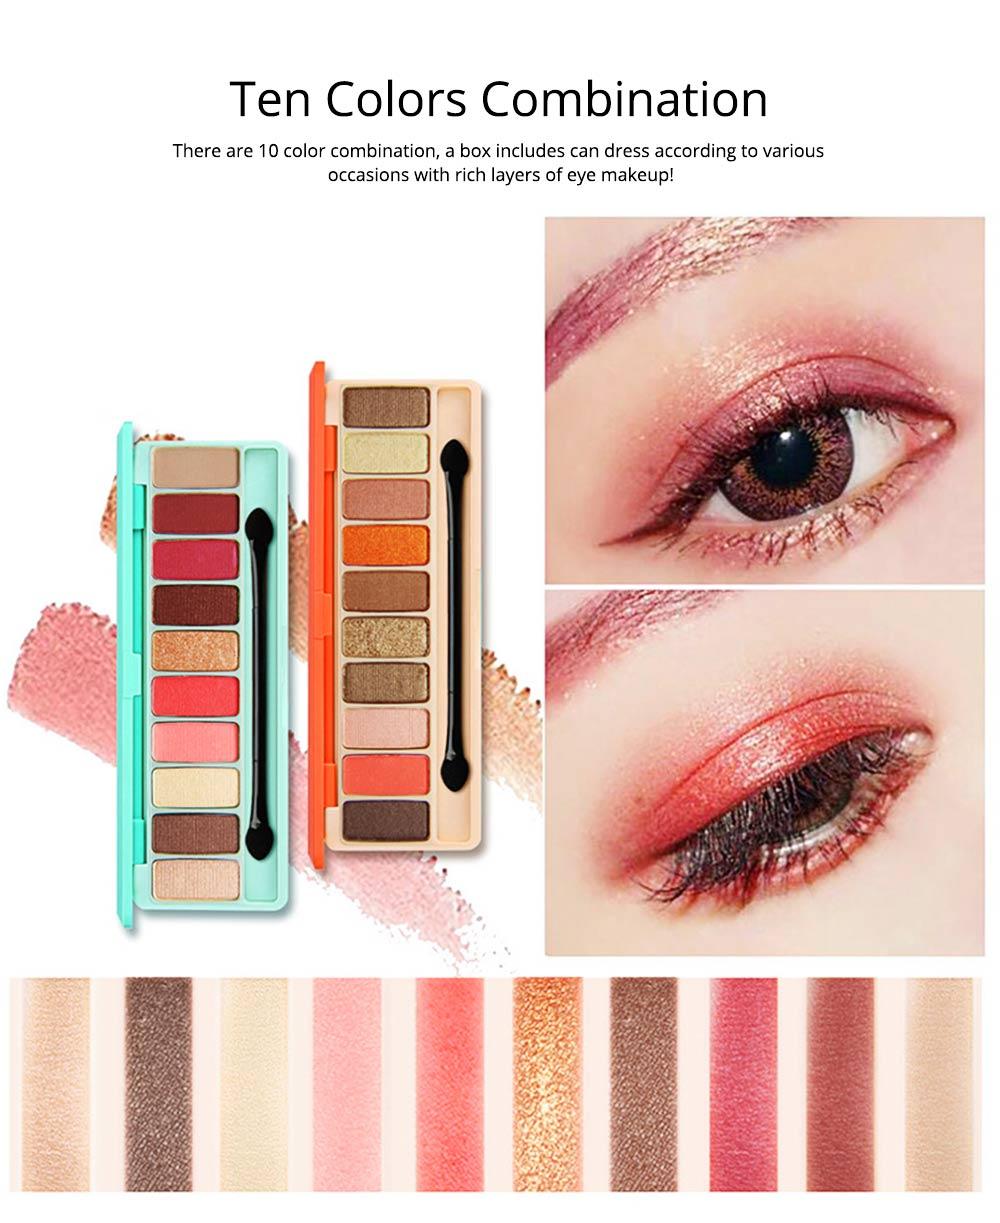 NOVO Ten Color Eye Shadow Palette, Long Lasting Eyeshadow Eye Shadow Kit, Girls Eye Makeup Beauty 1